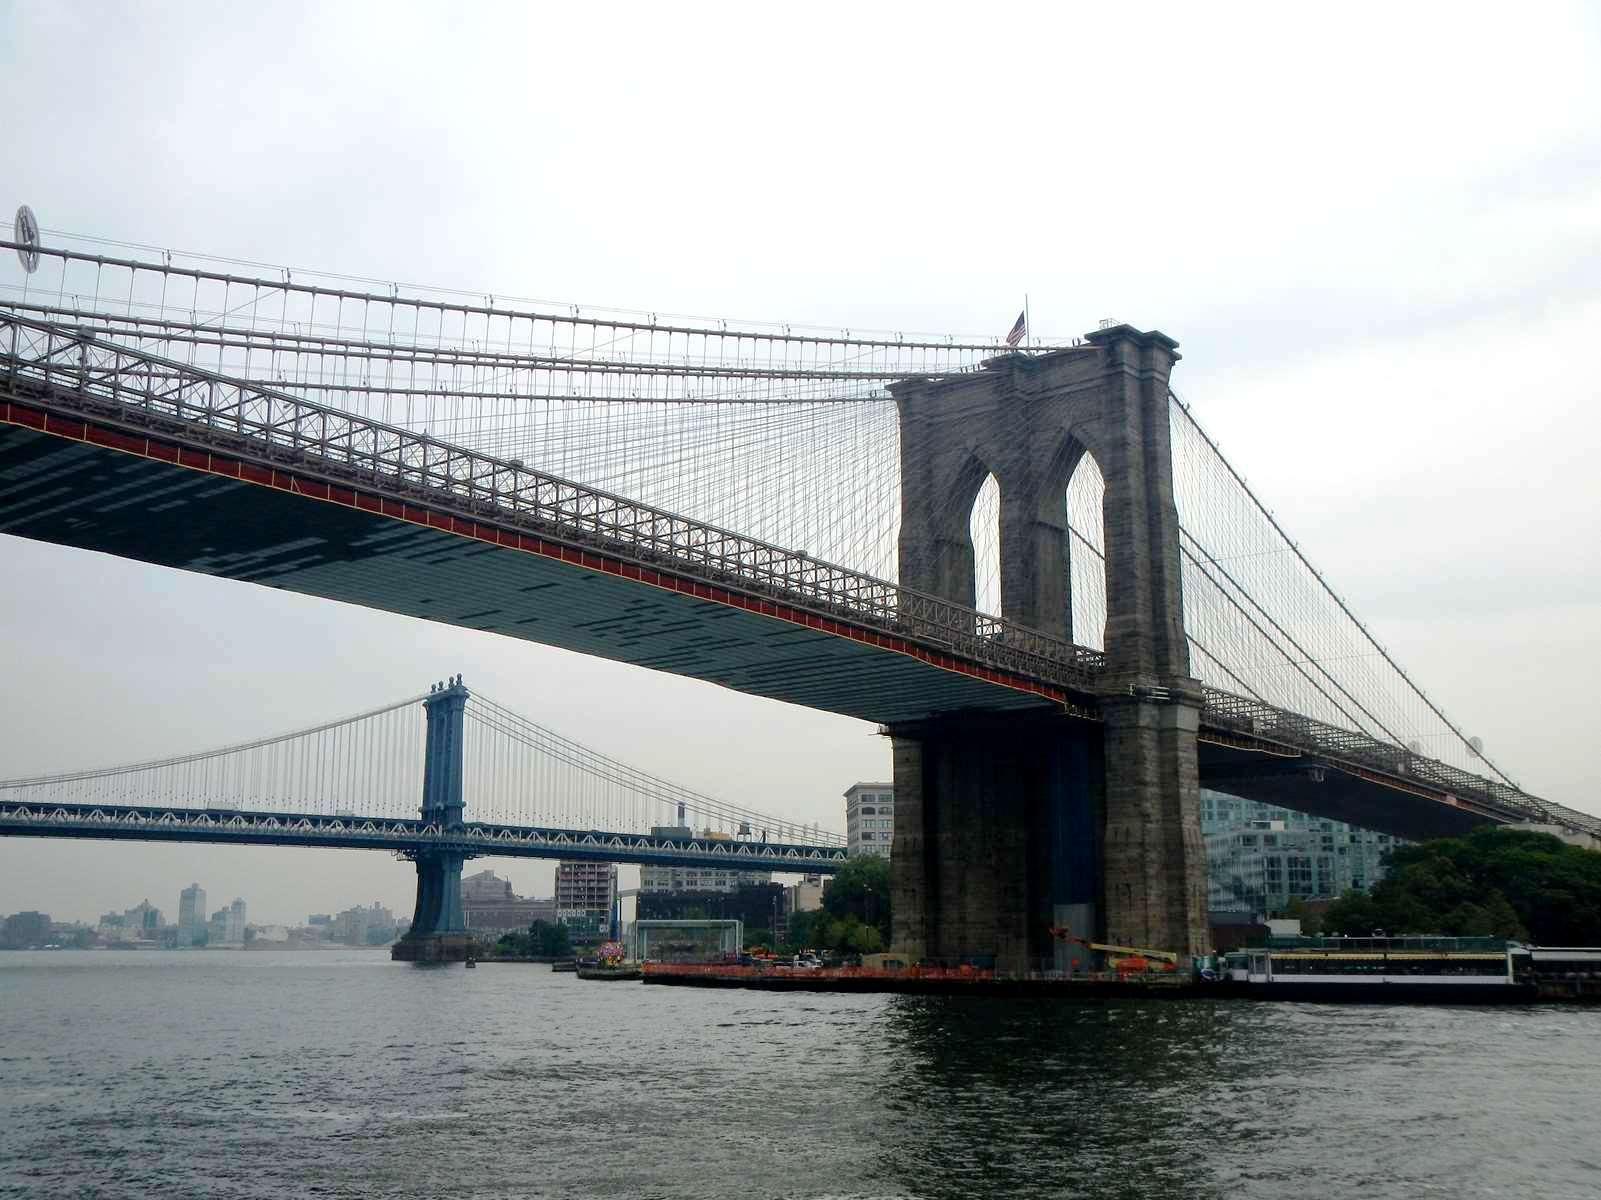 New York - Brooklyn Bridge Claironyva